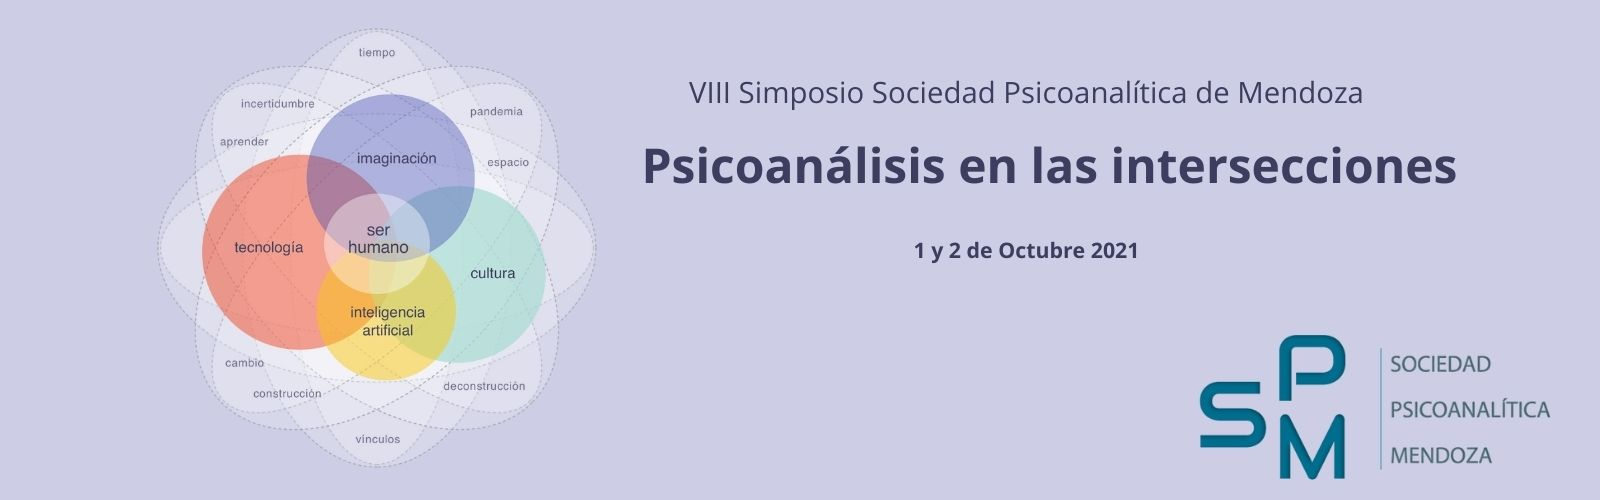 simposio psicoanalisis